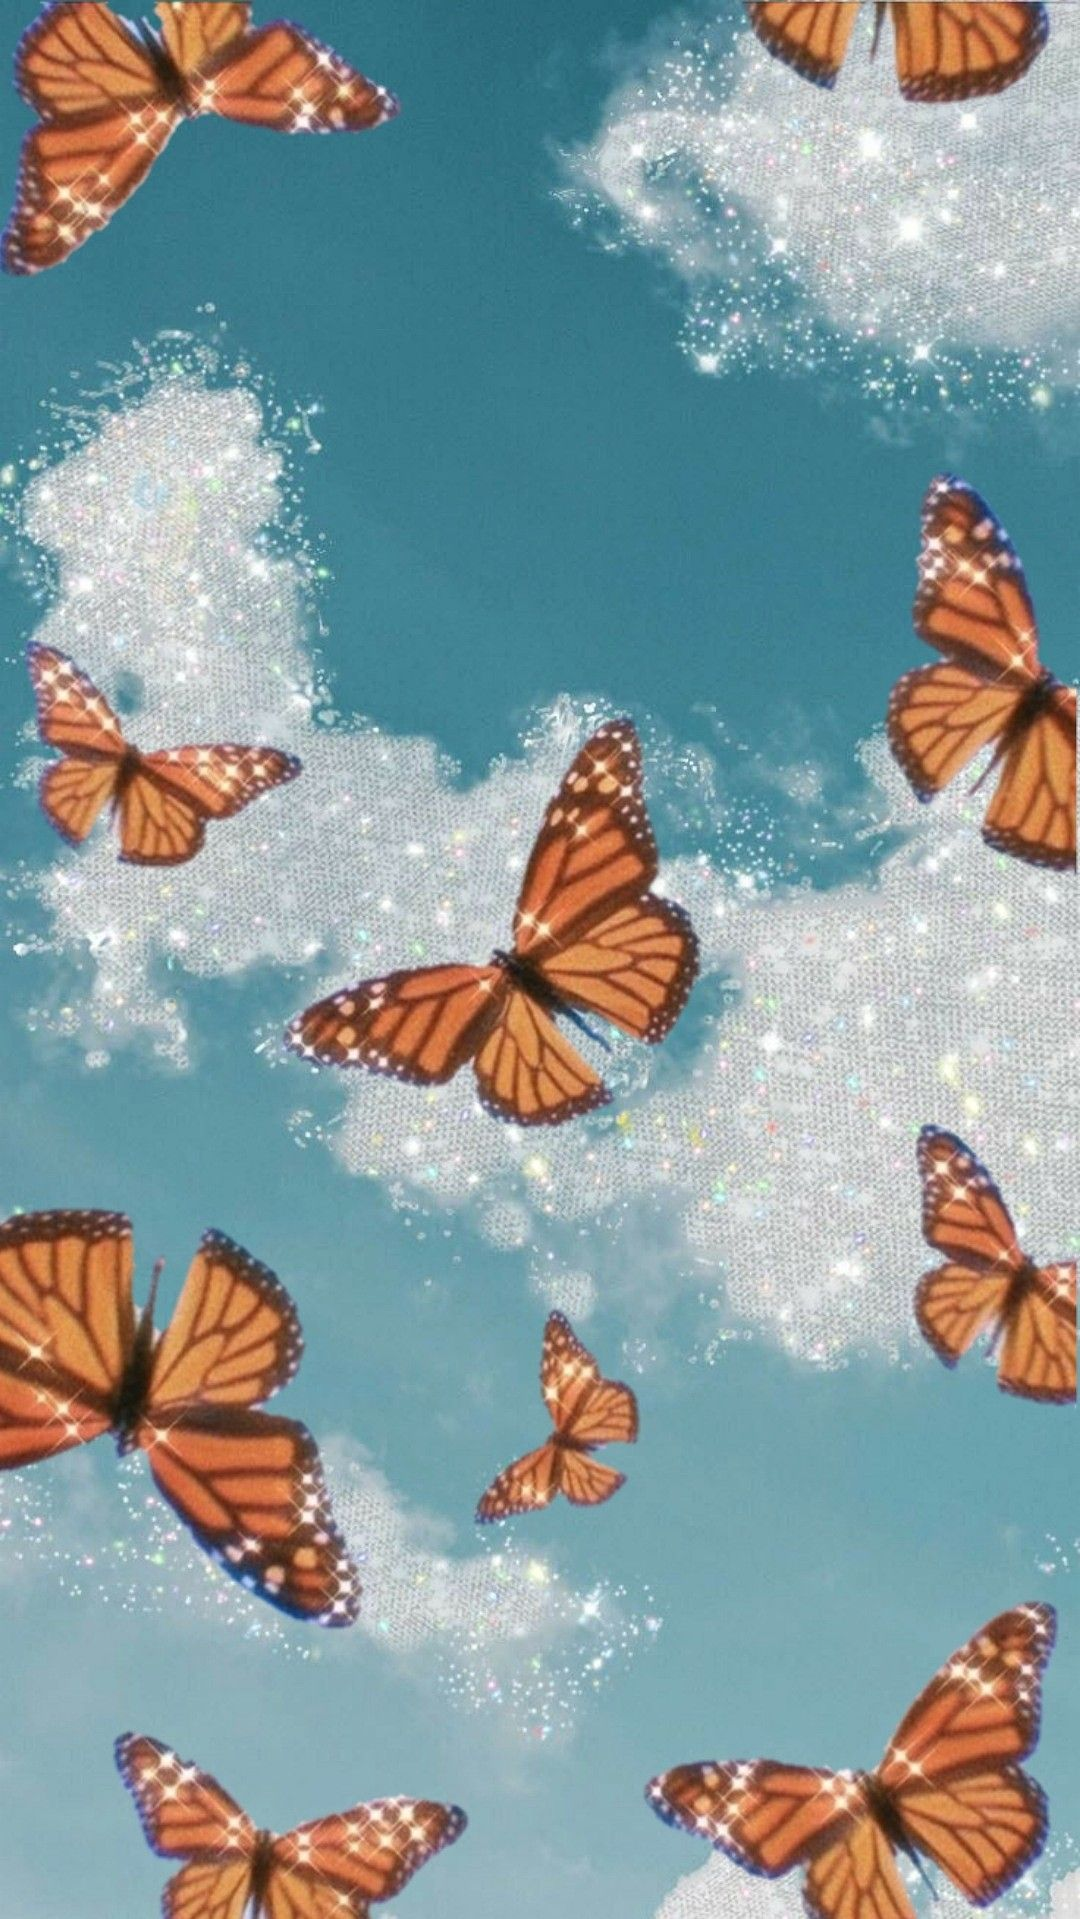 Butterfly wallpaper | Butterfly wallpaper, Butterfly ...